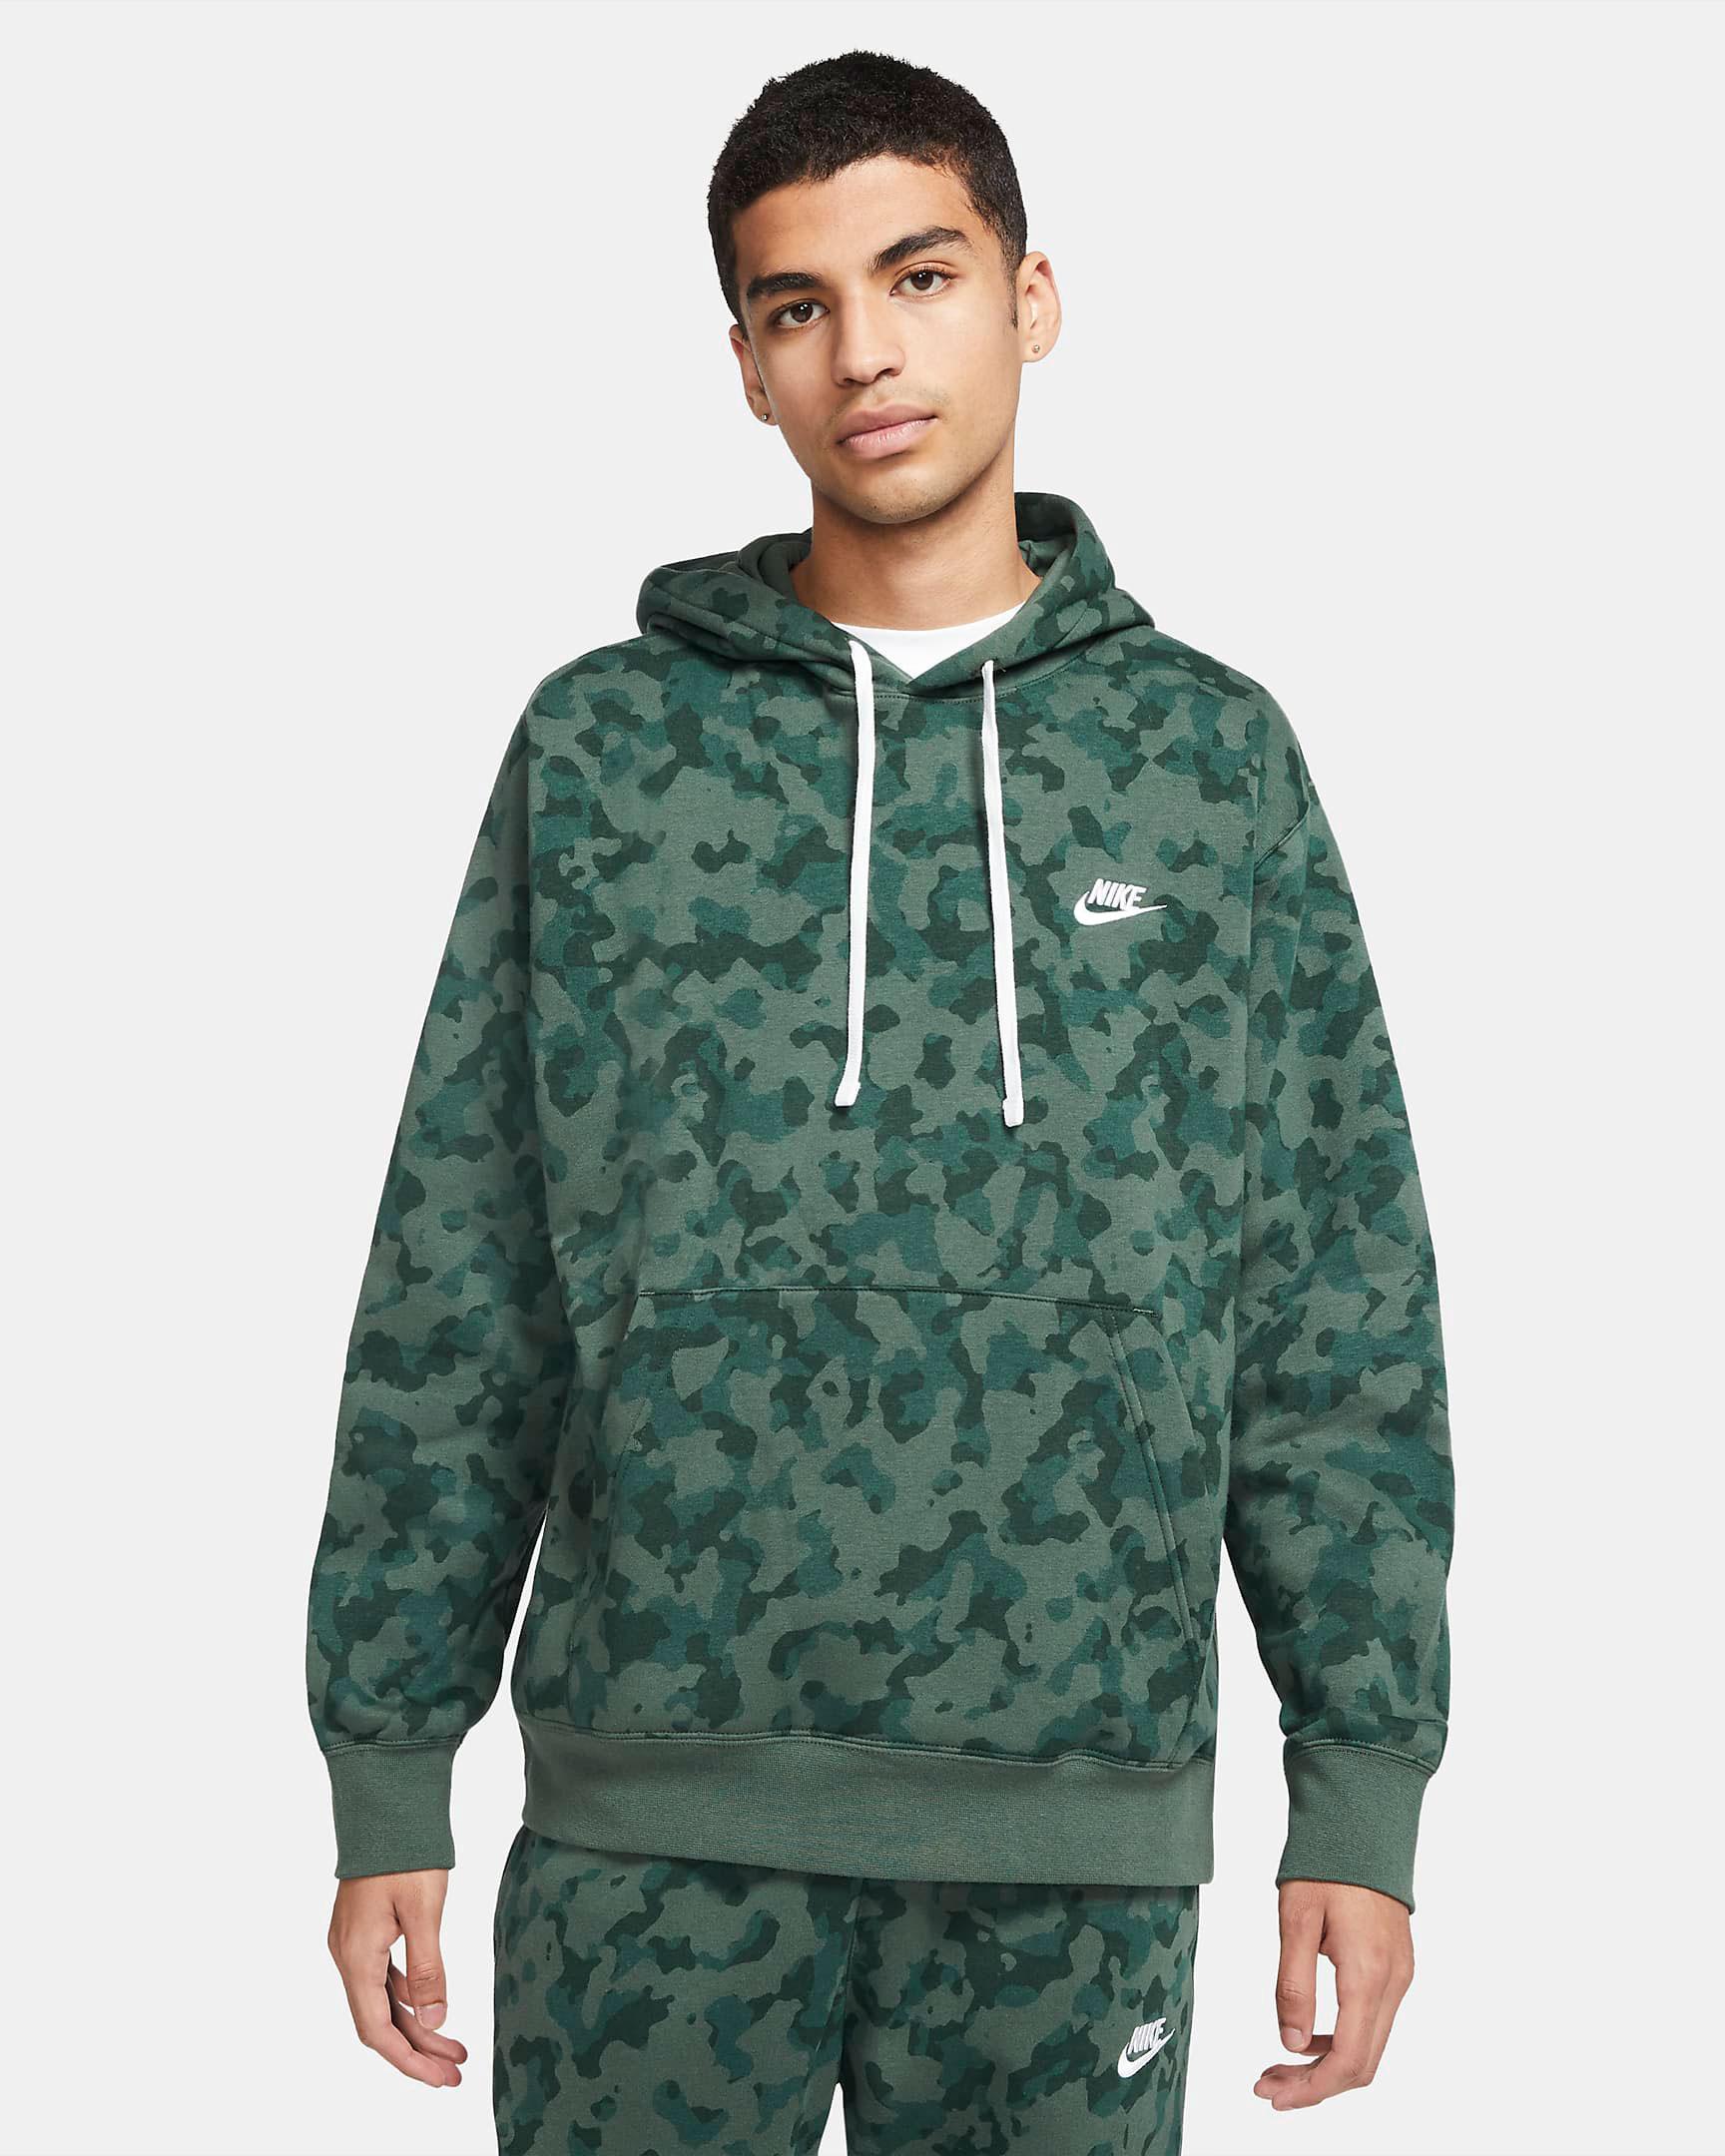 nike-galactic-jade-club-camo-hoodie